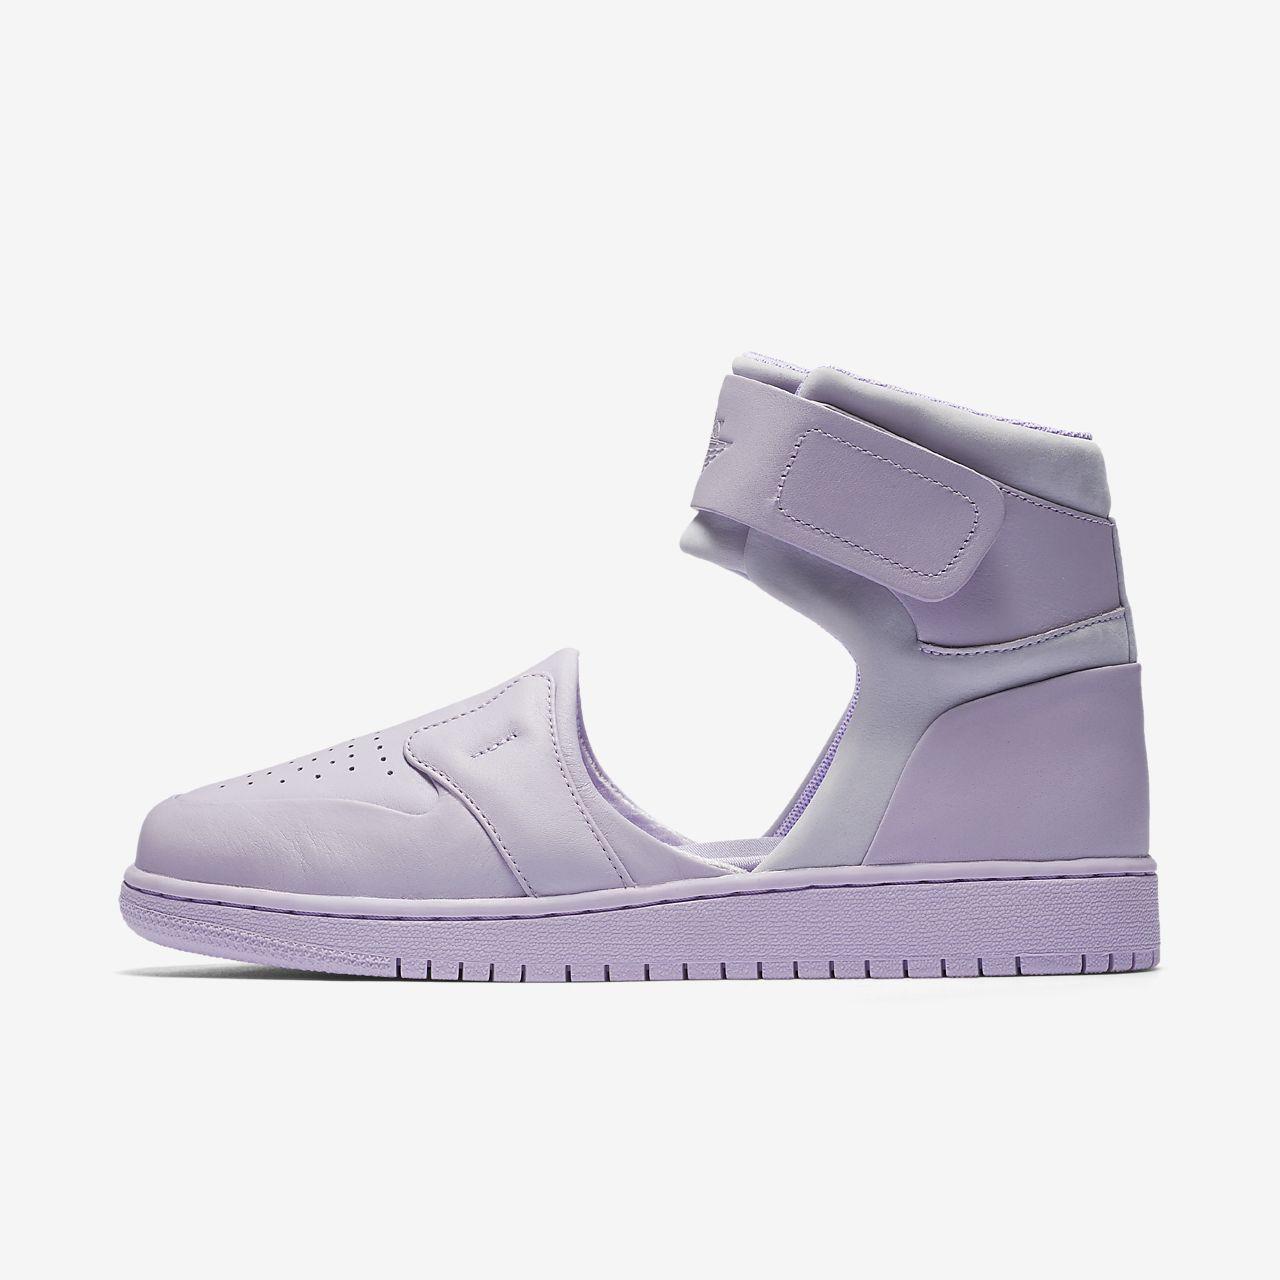 3969b5cd4609af Calzado para mujer Jordan AJ1 Lover XX. Nike.com MX